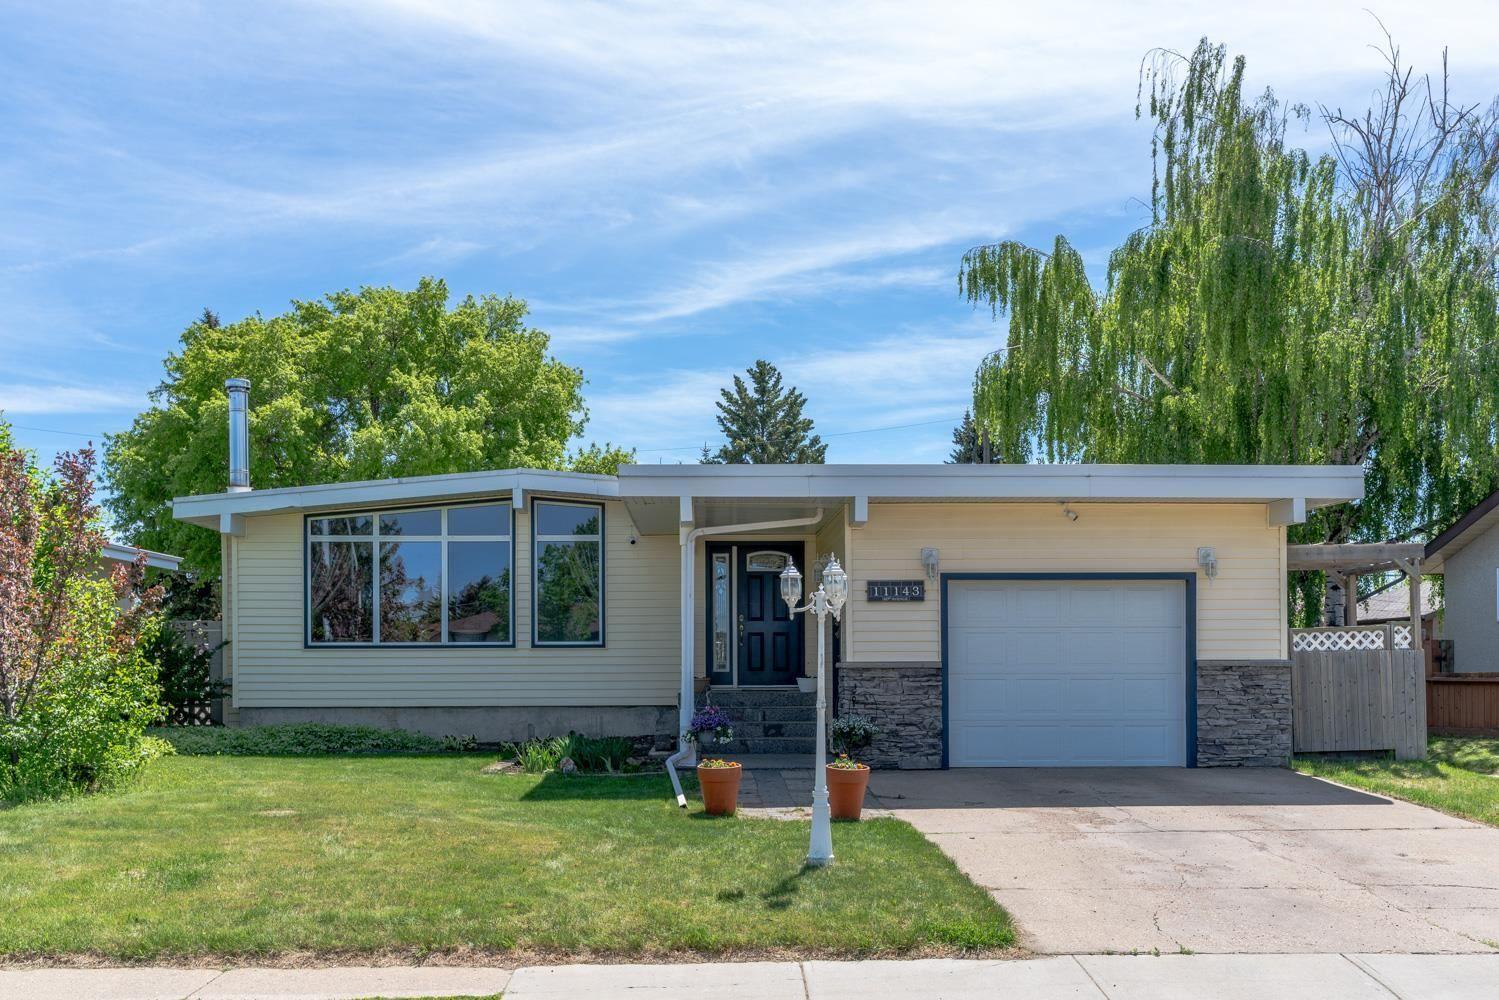 Main Photo: 11143 40 Avenue in Edmonton: Zone 16 House for sale : MLS®# E4255339